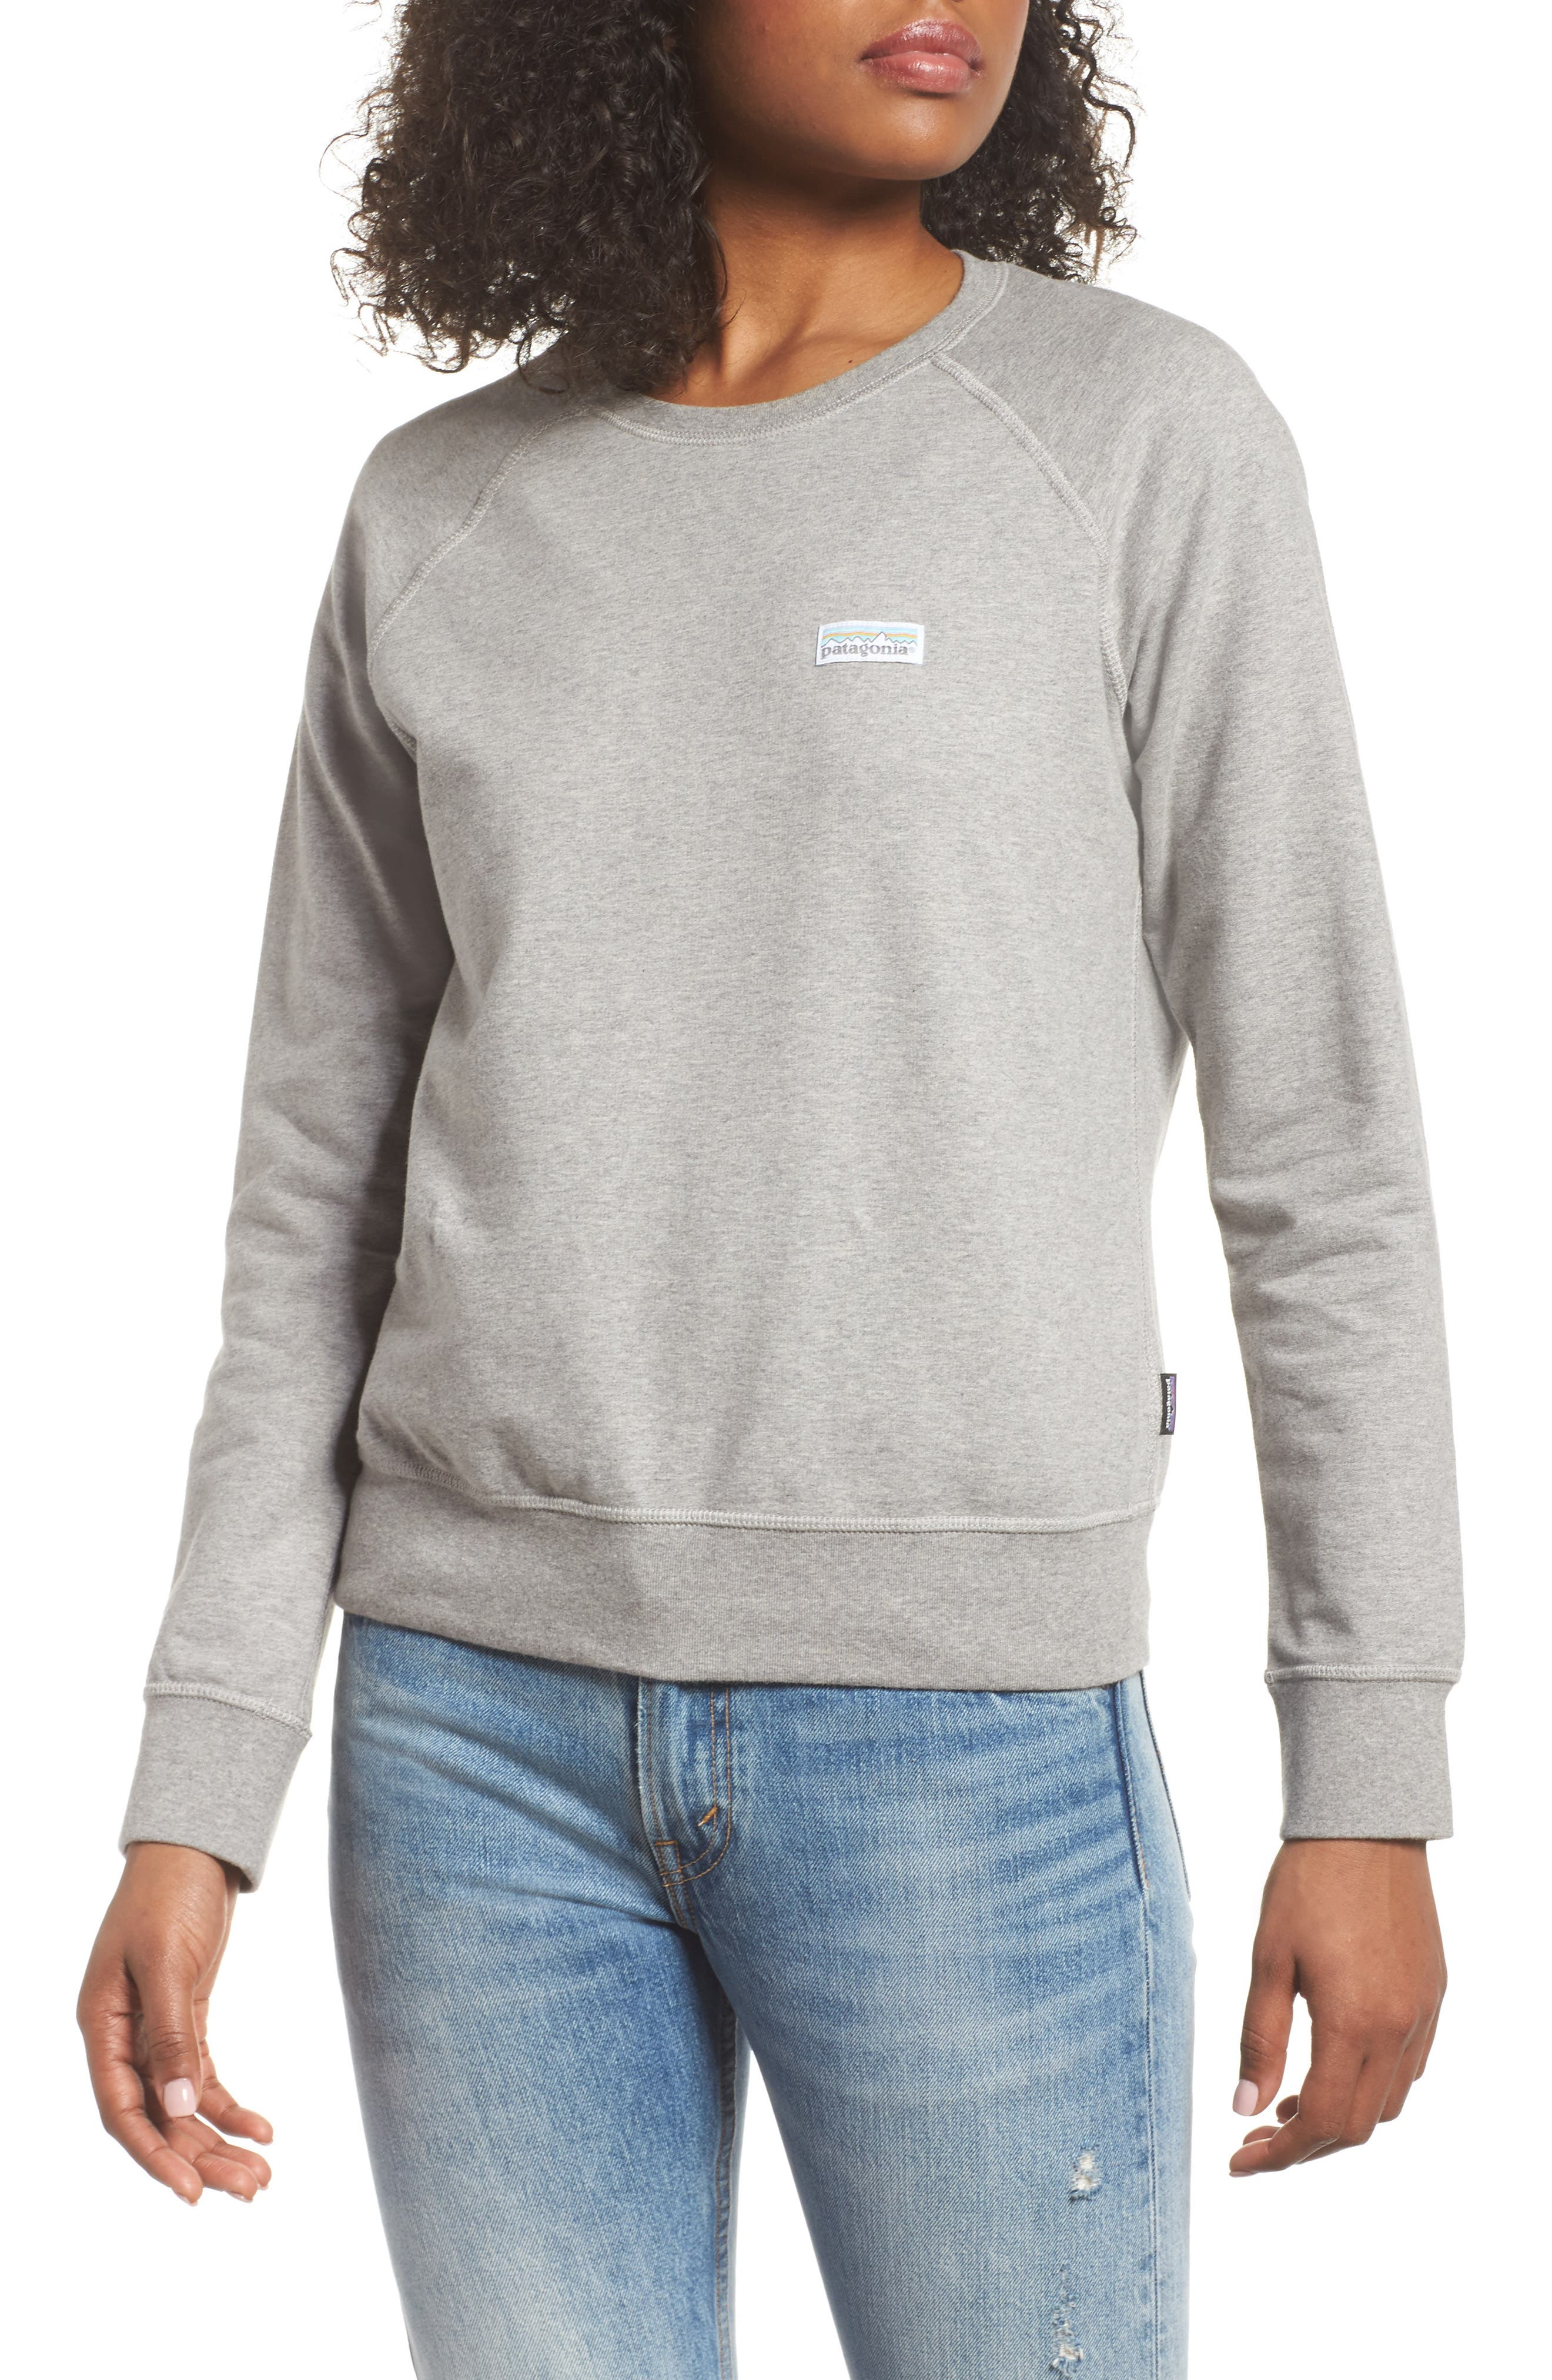 Pastel P-6 Label Midweight Sweatshirt,                         Main,                         color, 020